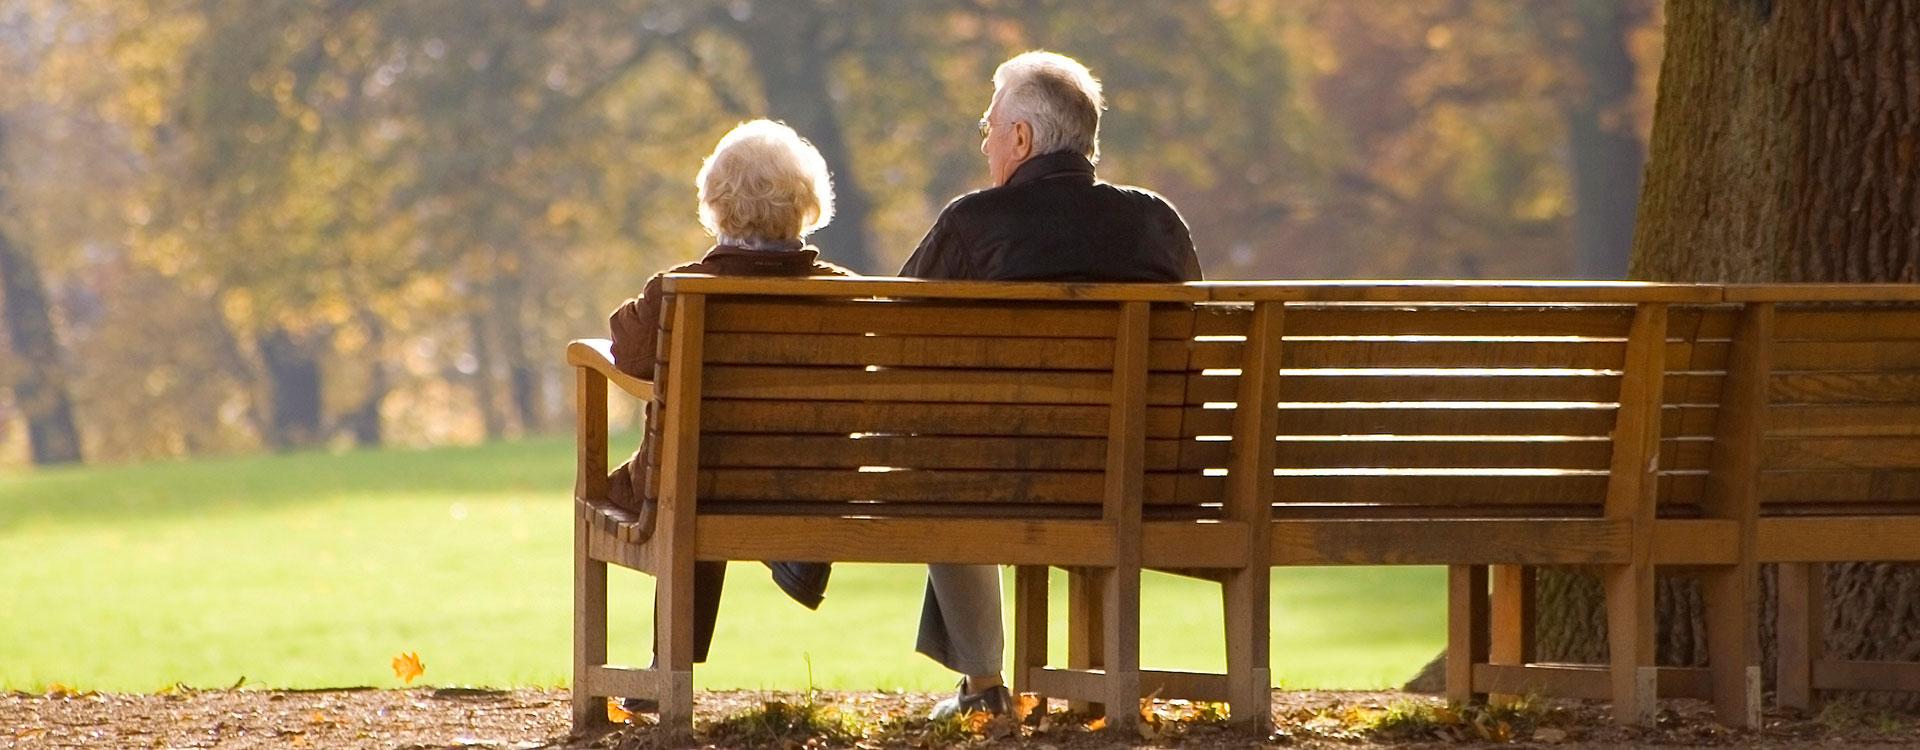 slider-couple-on-bench